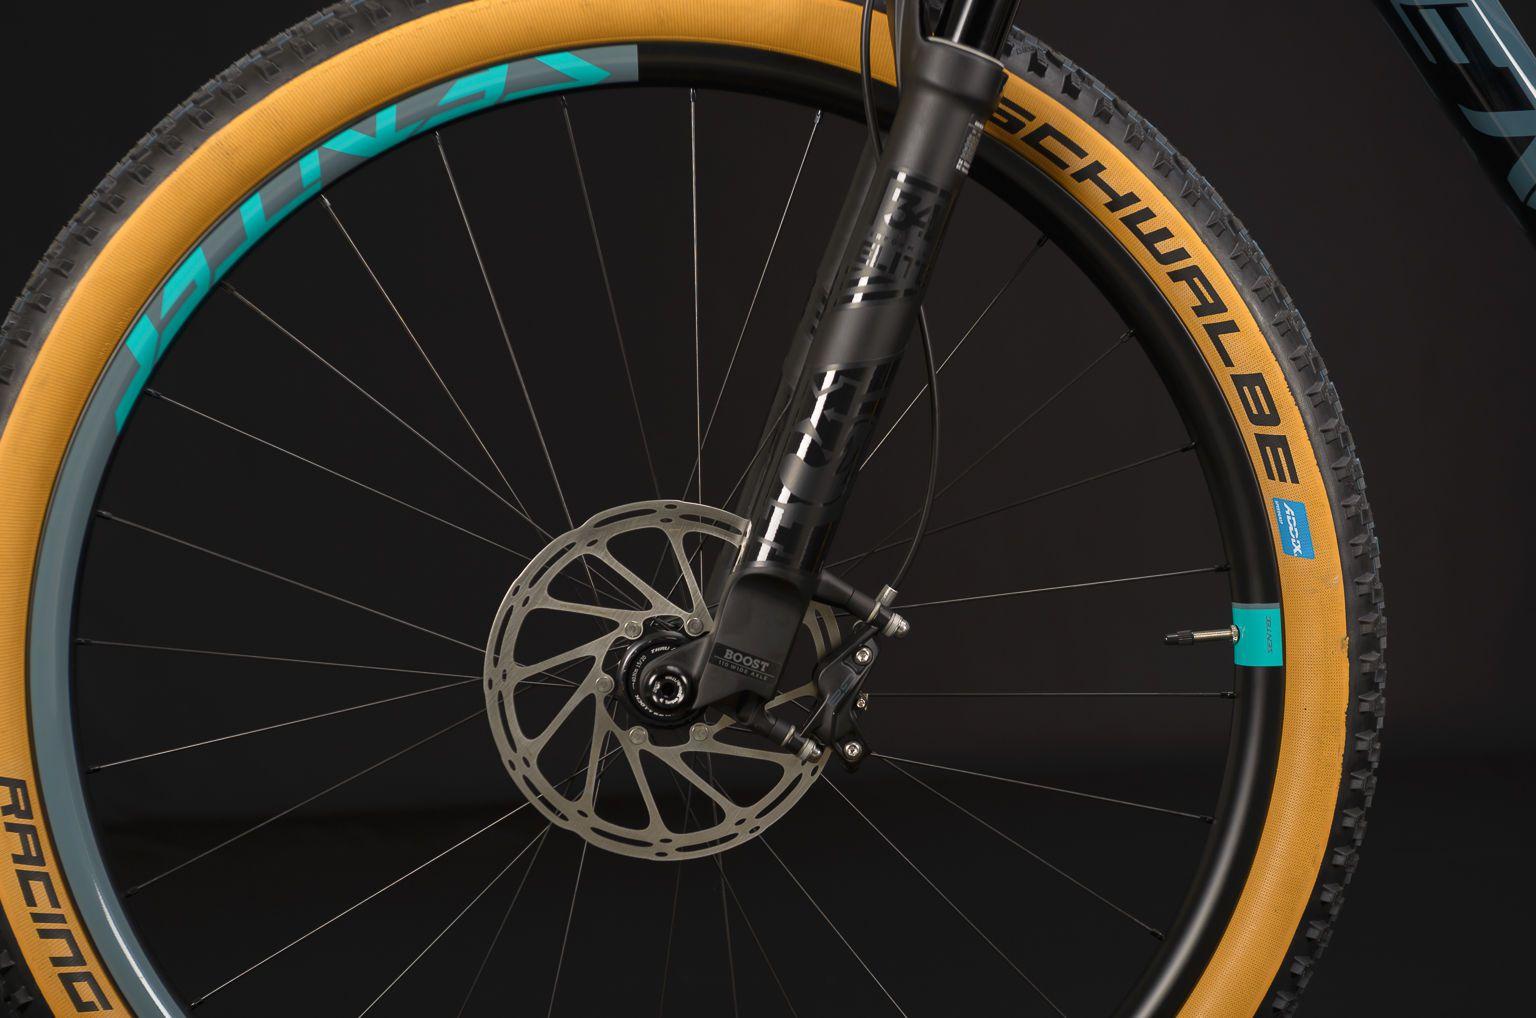 Bicicleta SENSE Invictus Factory 2020 - Azul/Chumbo